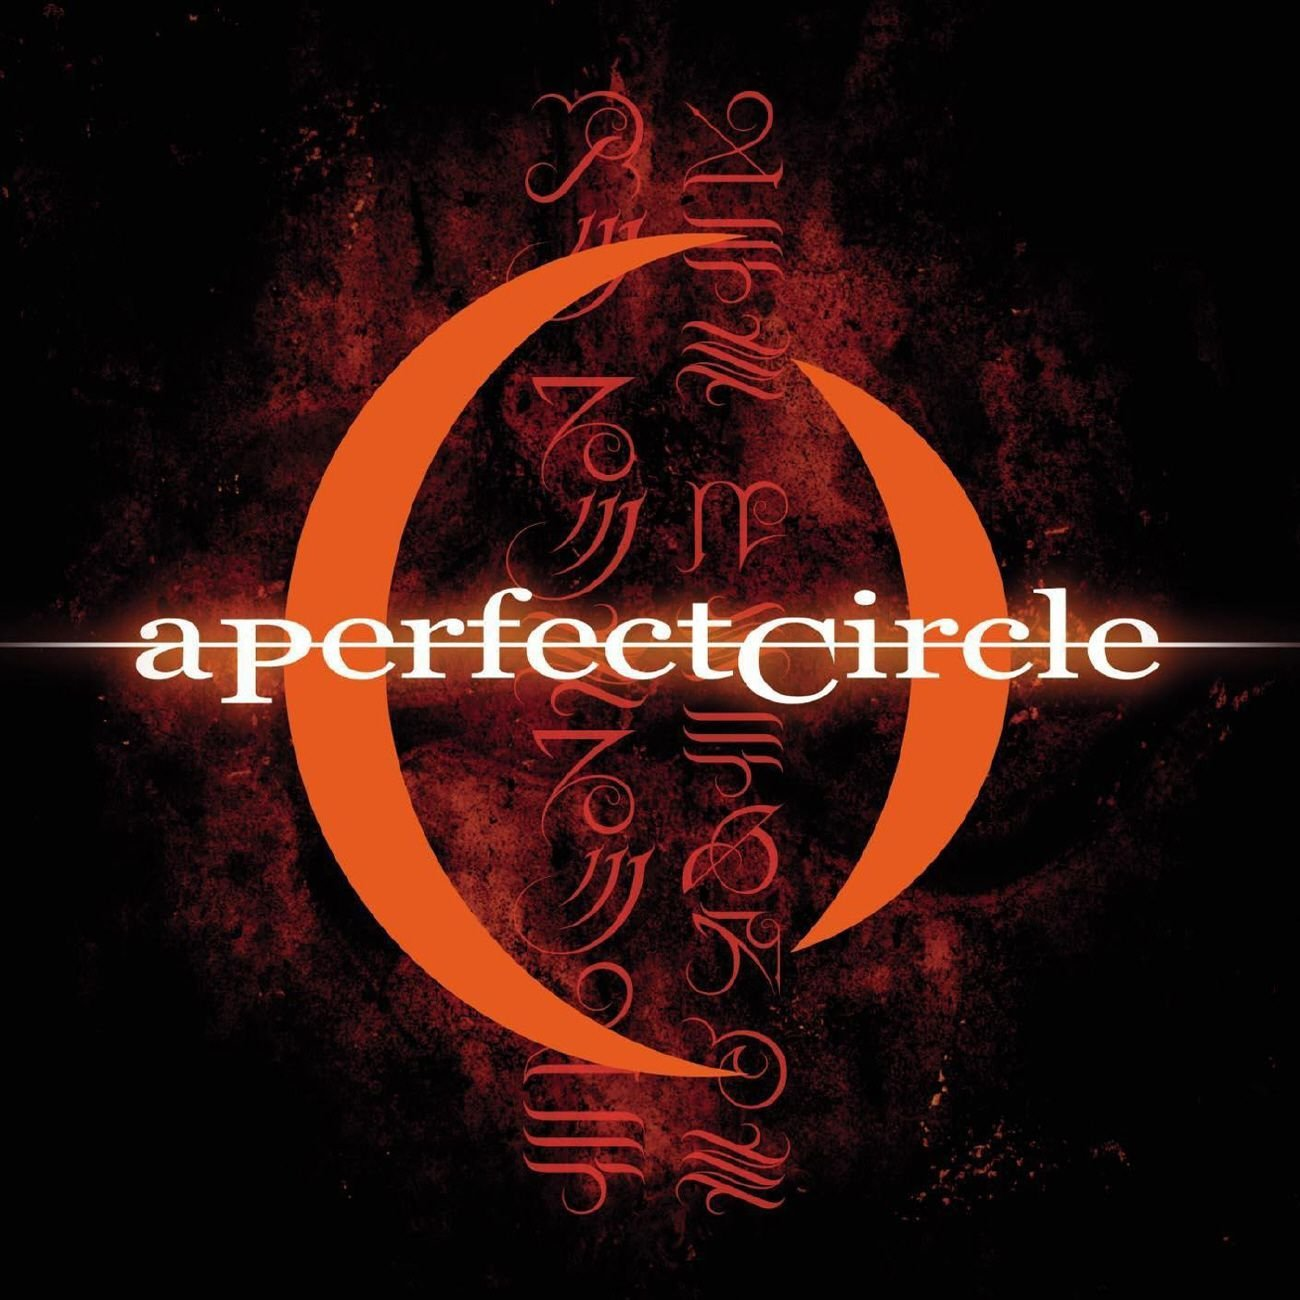 A Perfect Circle Tour 2020 Home